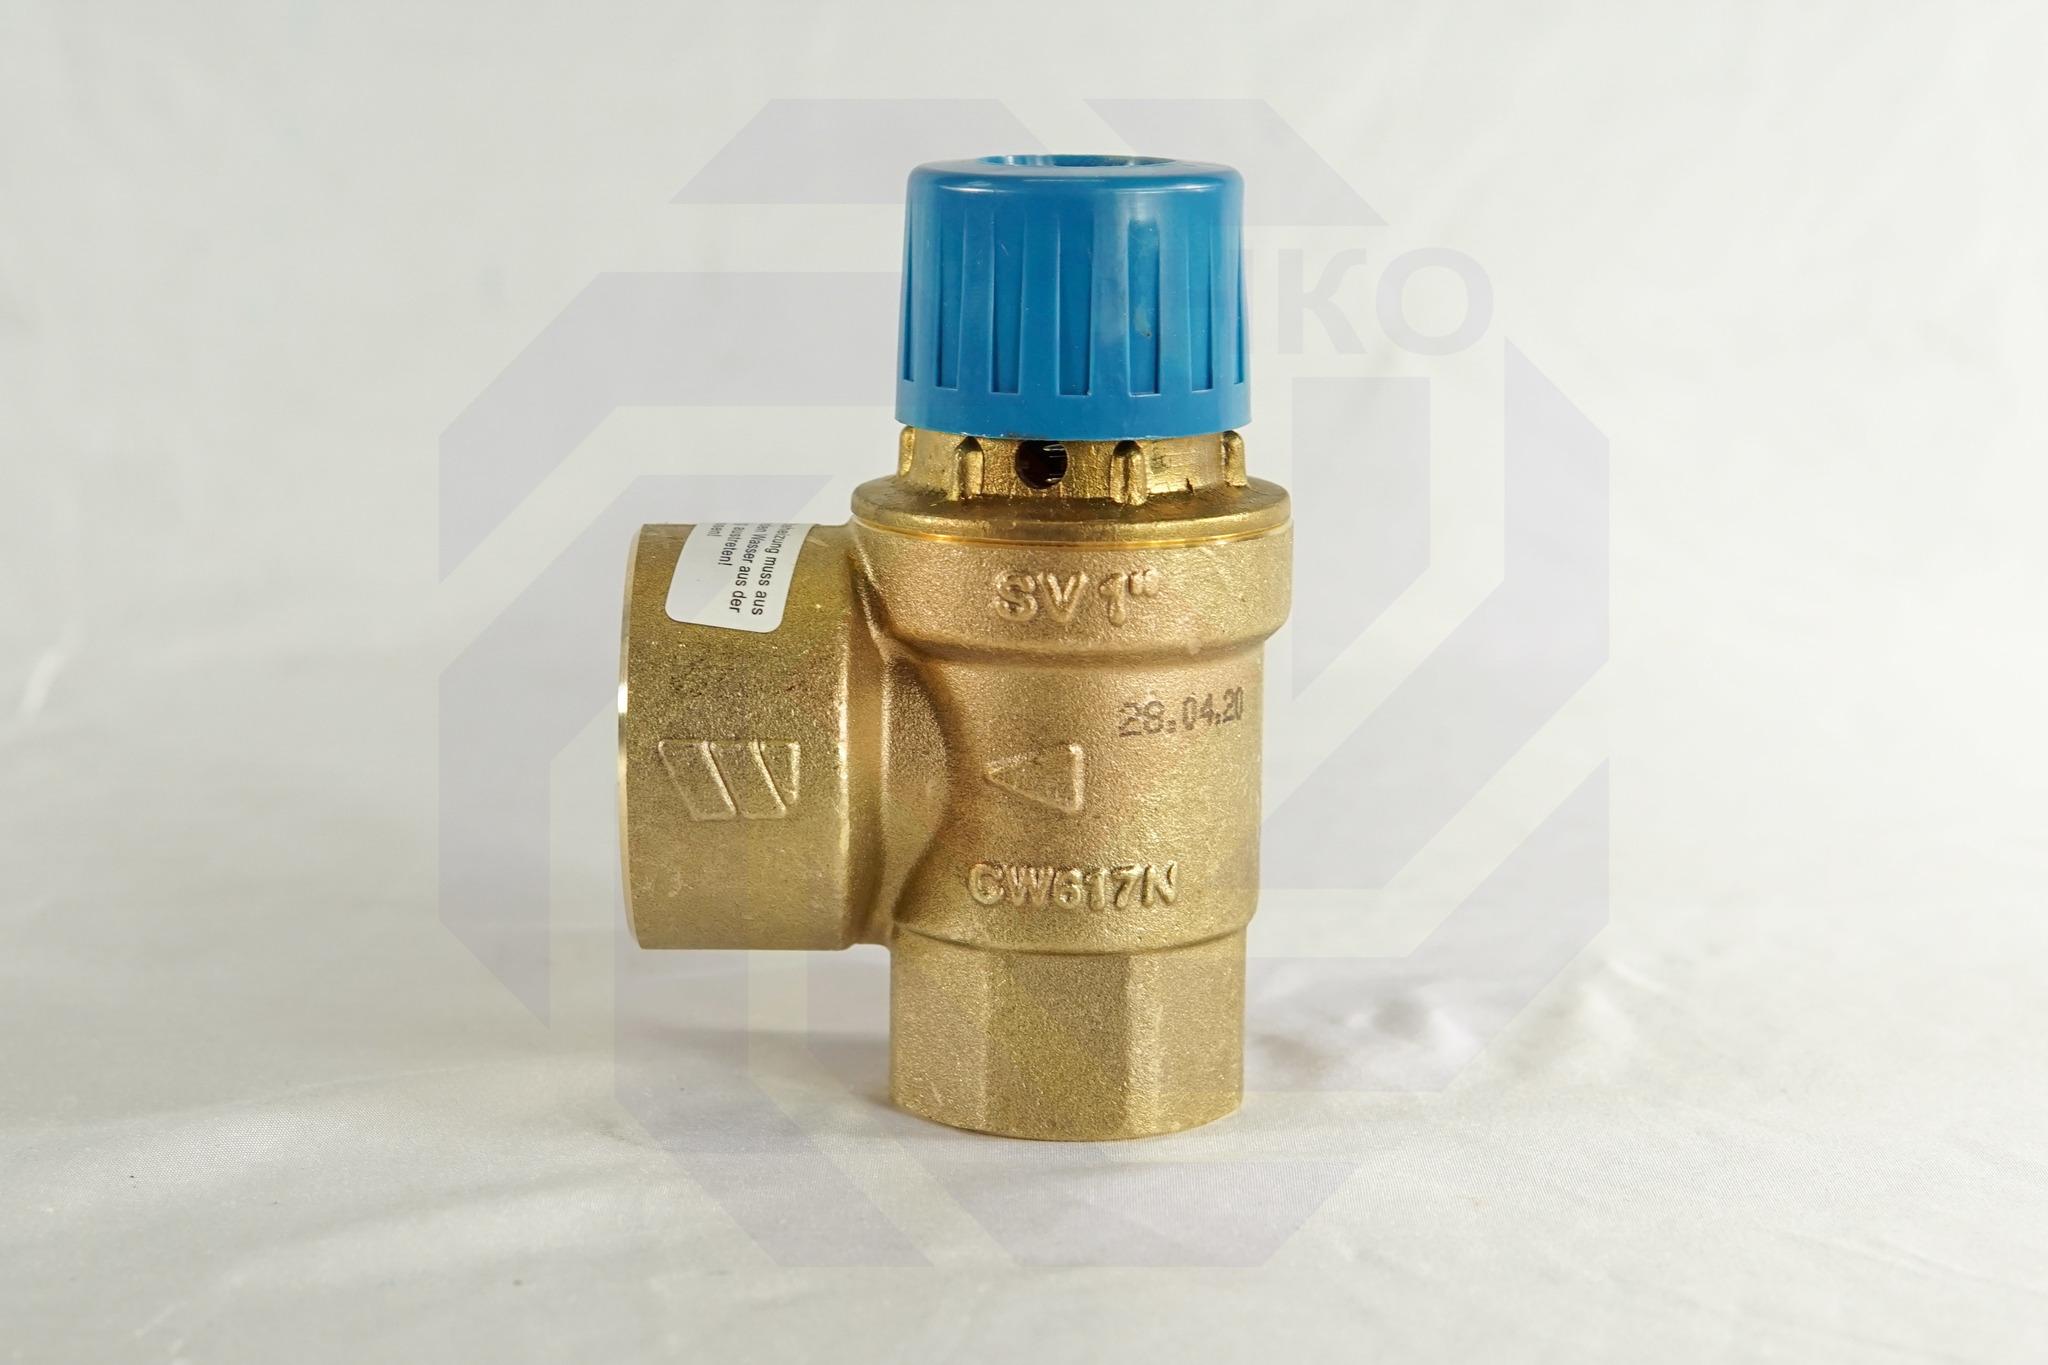 Клапан предохранительный WATTS SVW 4 бар 1